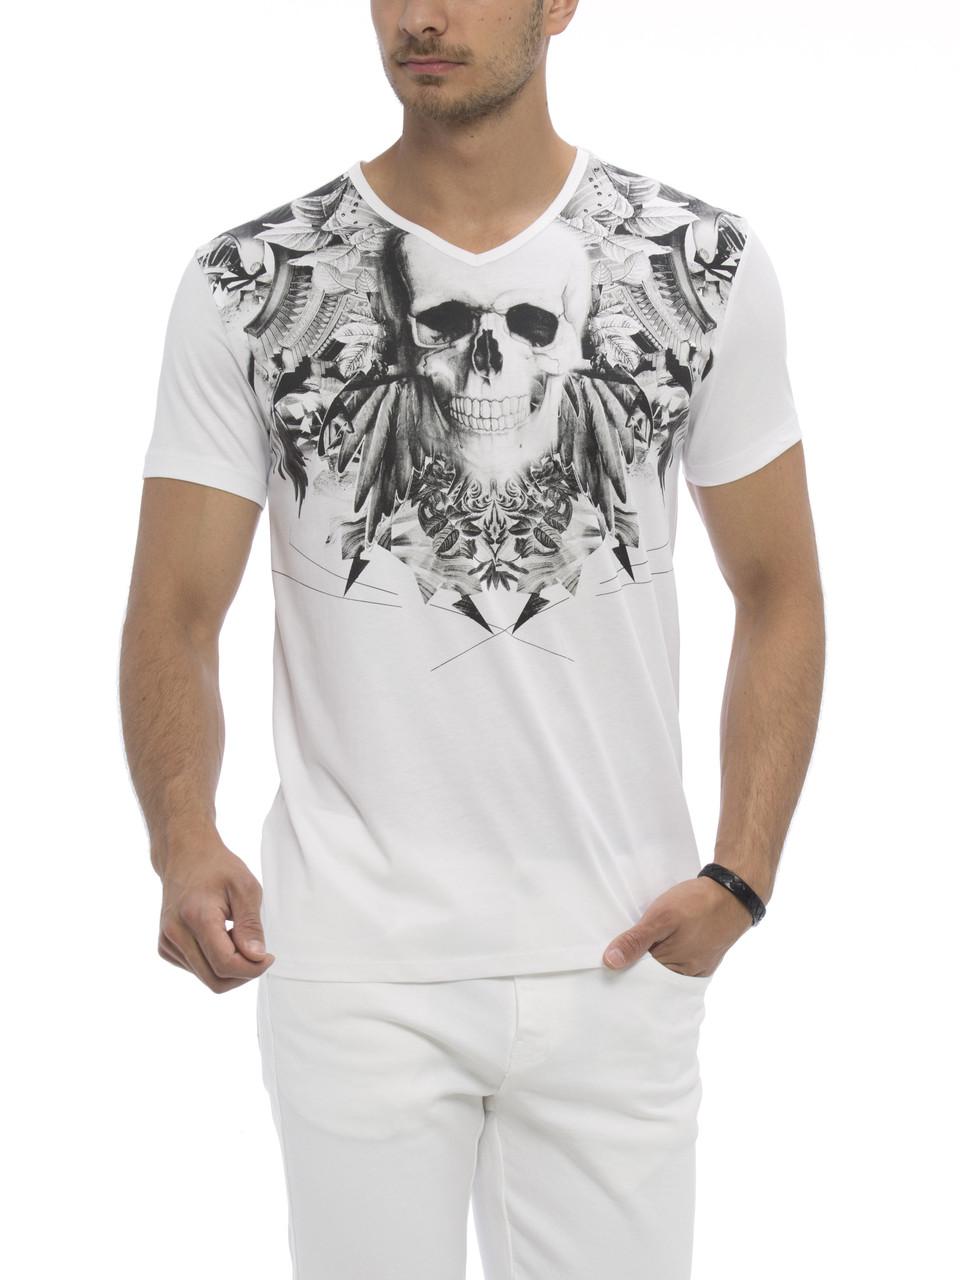 Белая мужская футболка Lc Waikiki / Лс Вайкики с черепом на груди